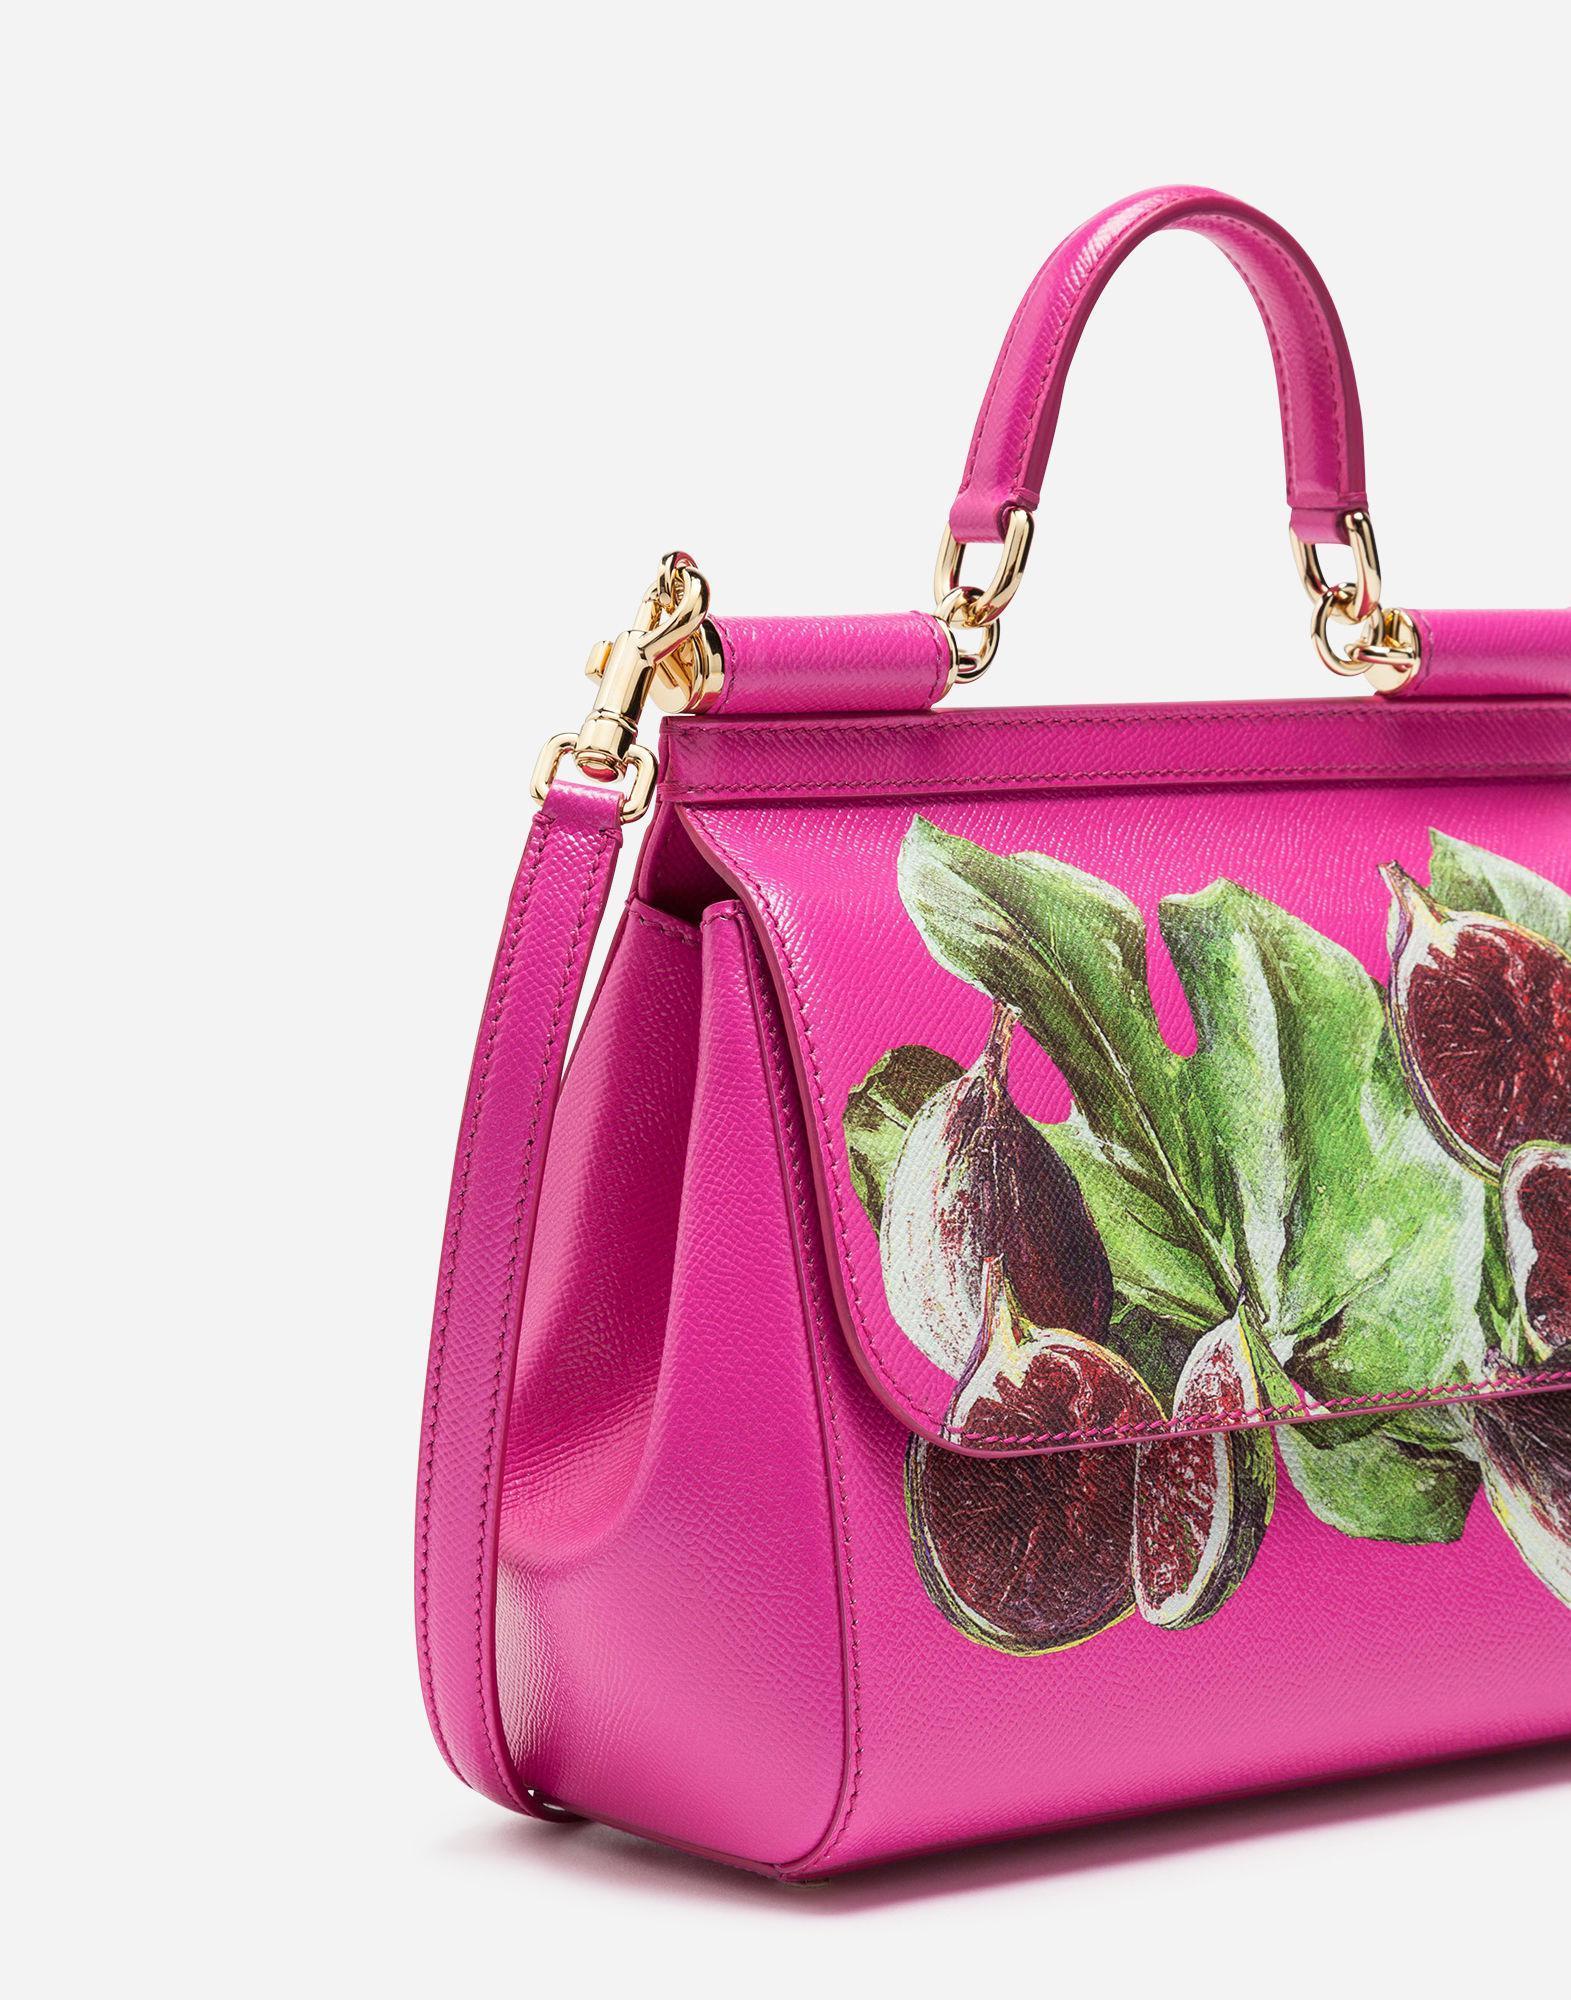 fa717afb2da ... Lyst - Dolce Gabbana Sicily Handbag In Printed Dauphine Cal official  photos a33e0 970fe  Dolce Gabbana. Womens Pink Small Sicily Dauphine  Leather Bag ...